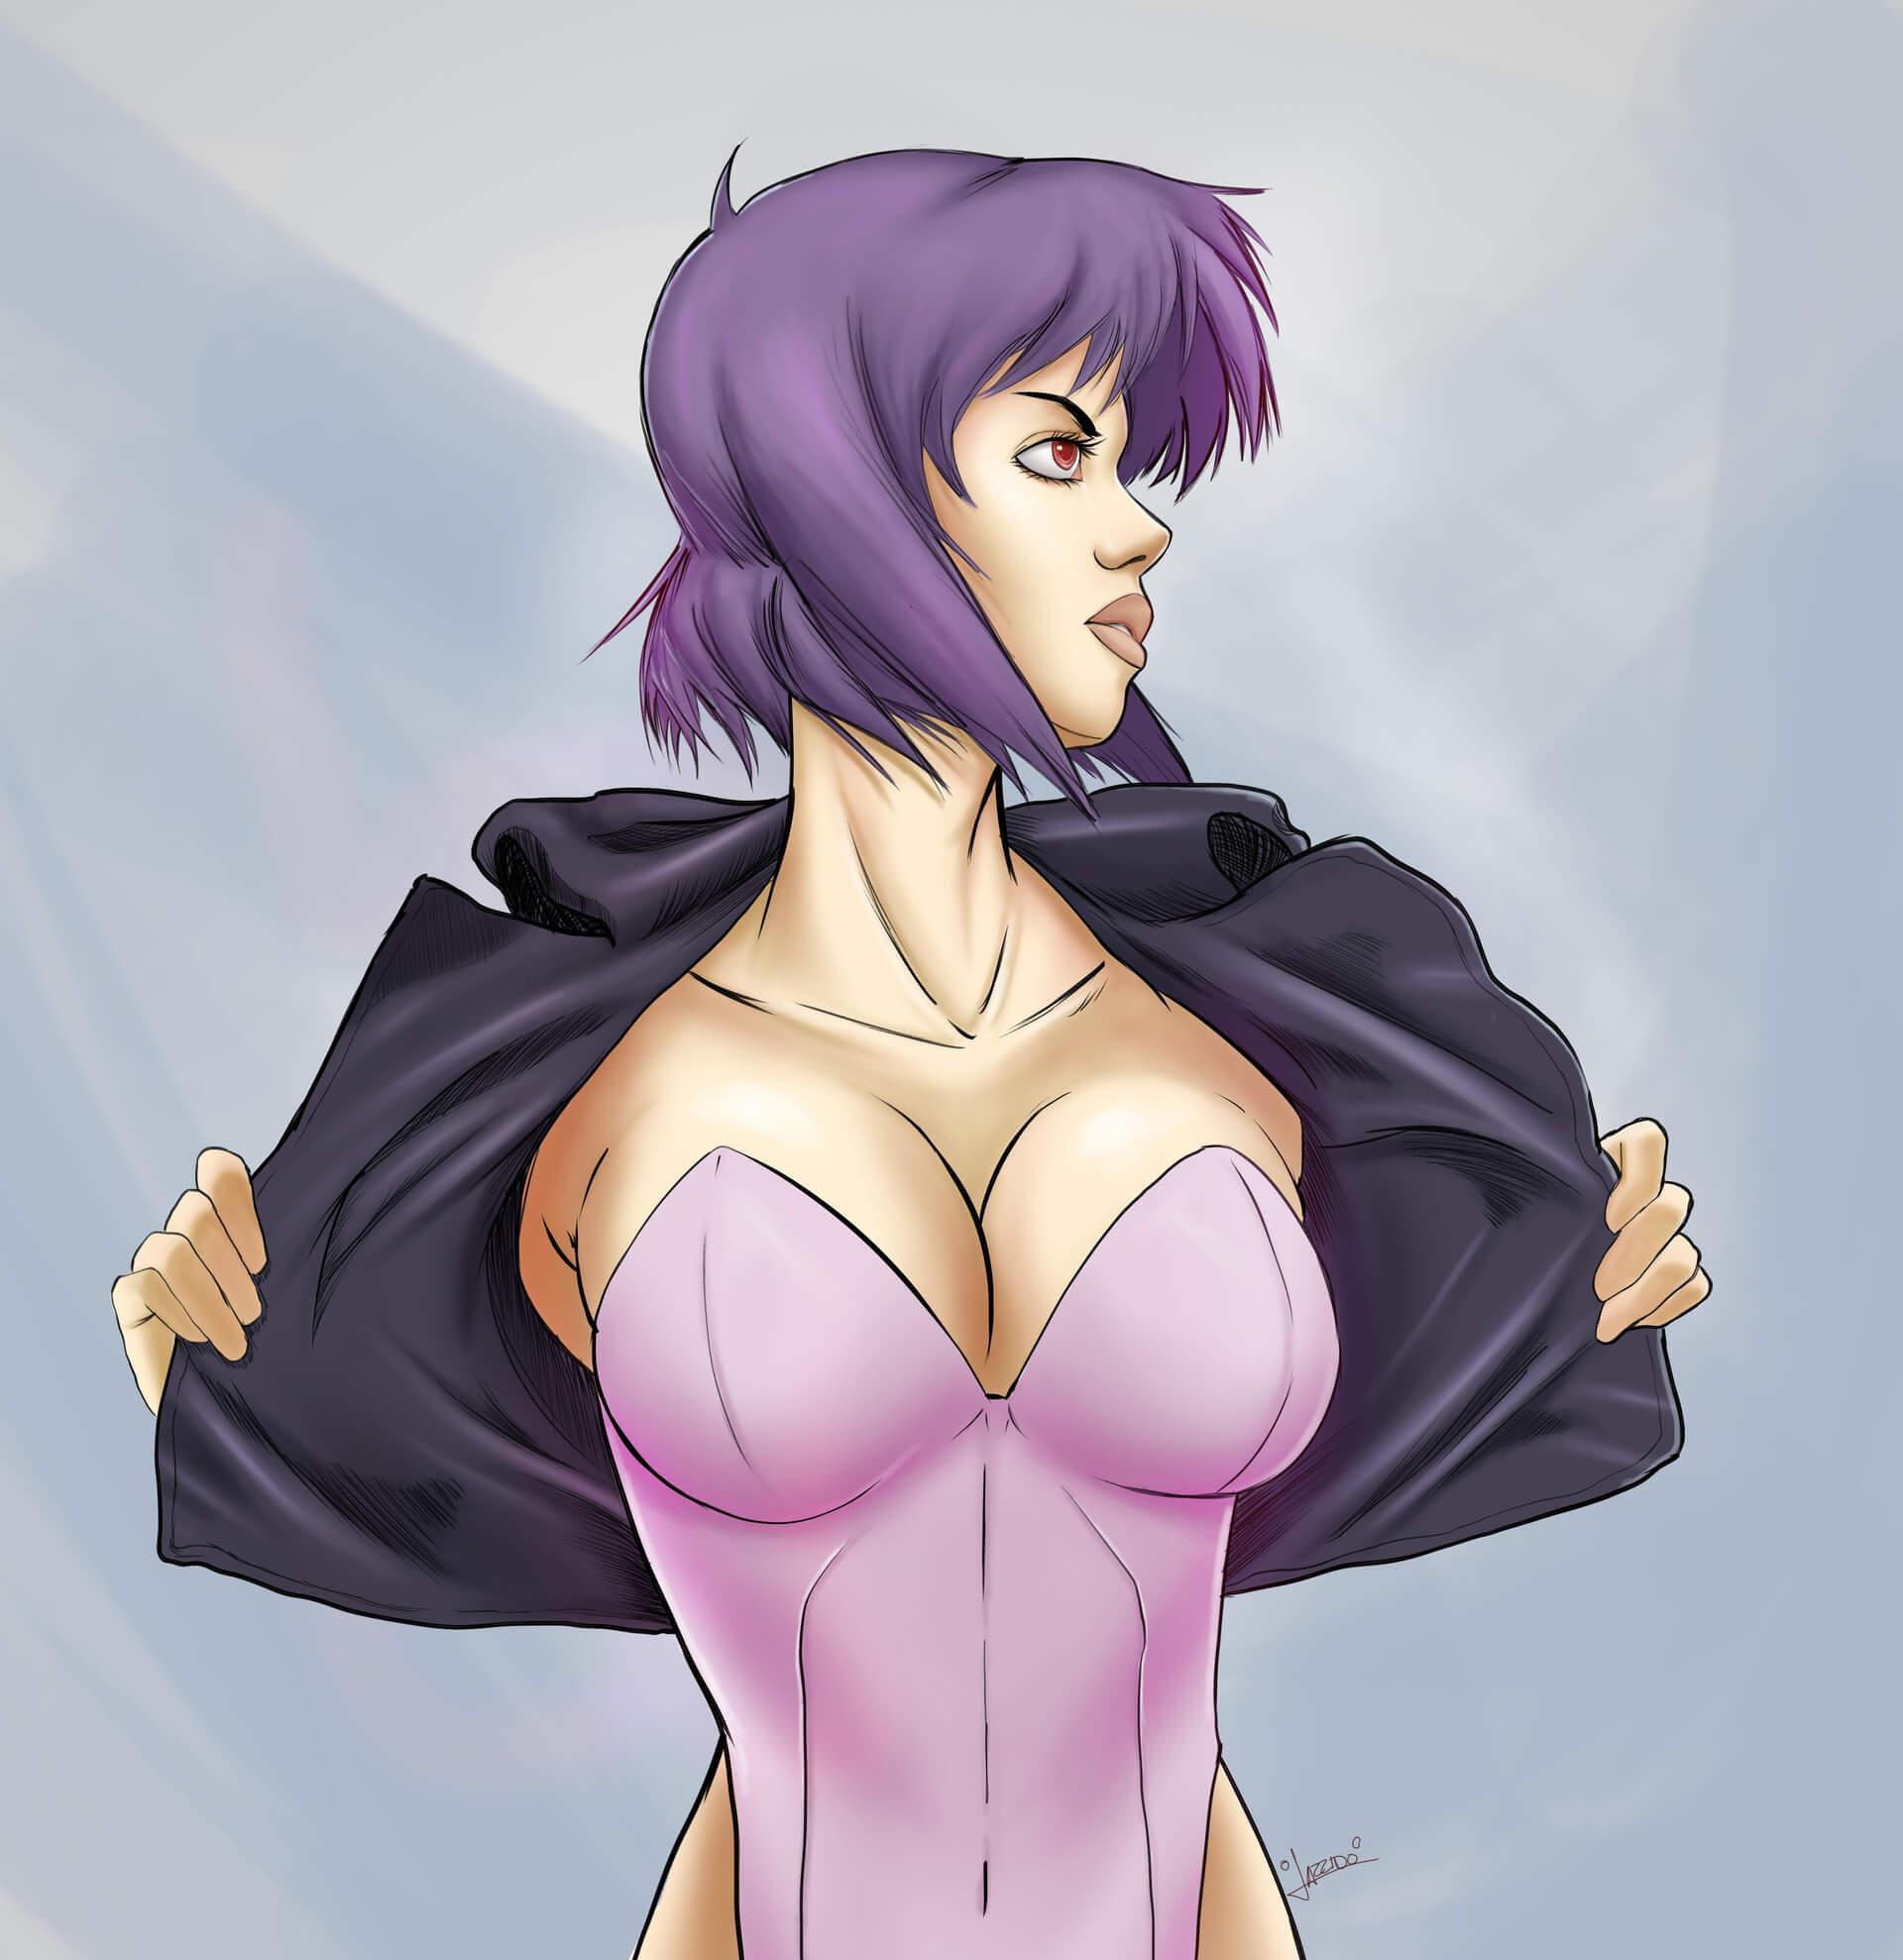 Major Motoko Kusanagi sexy cleavage